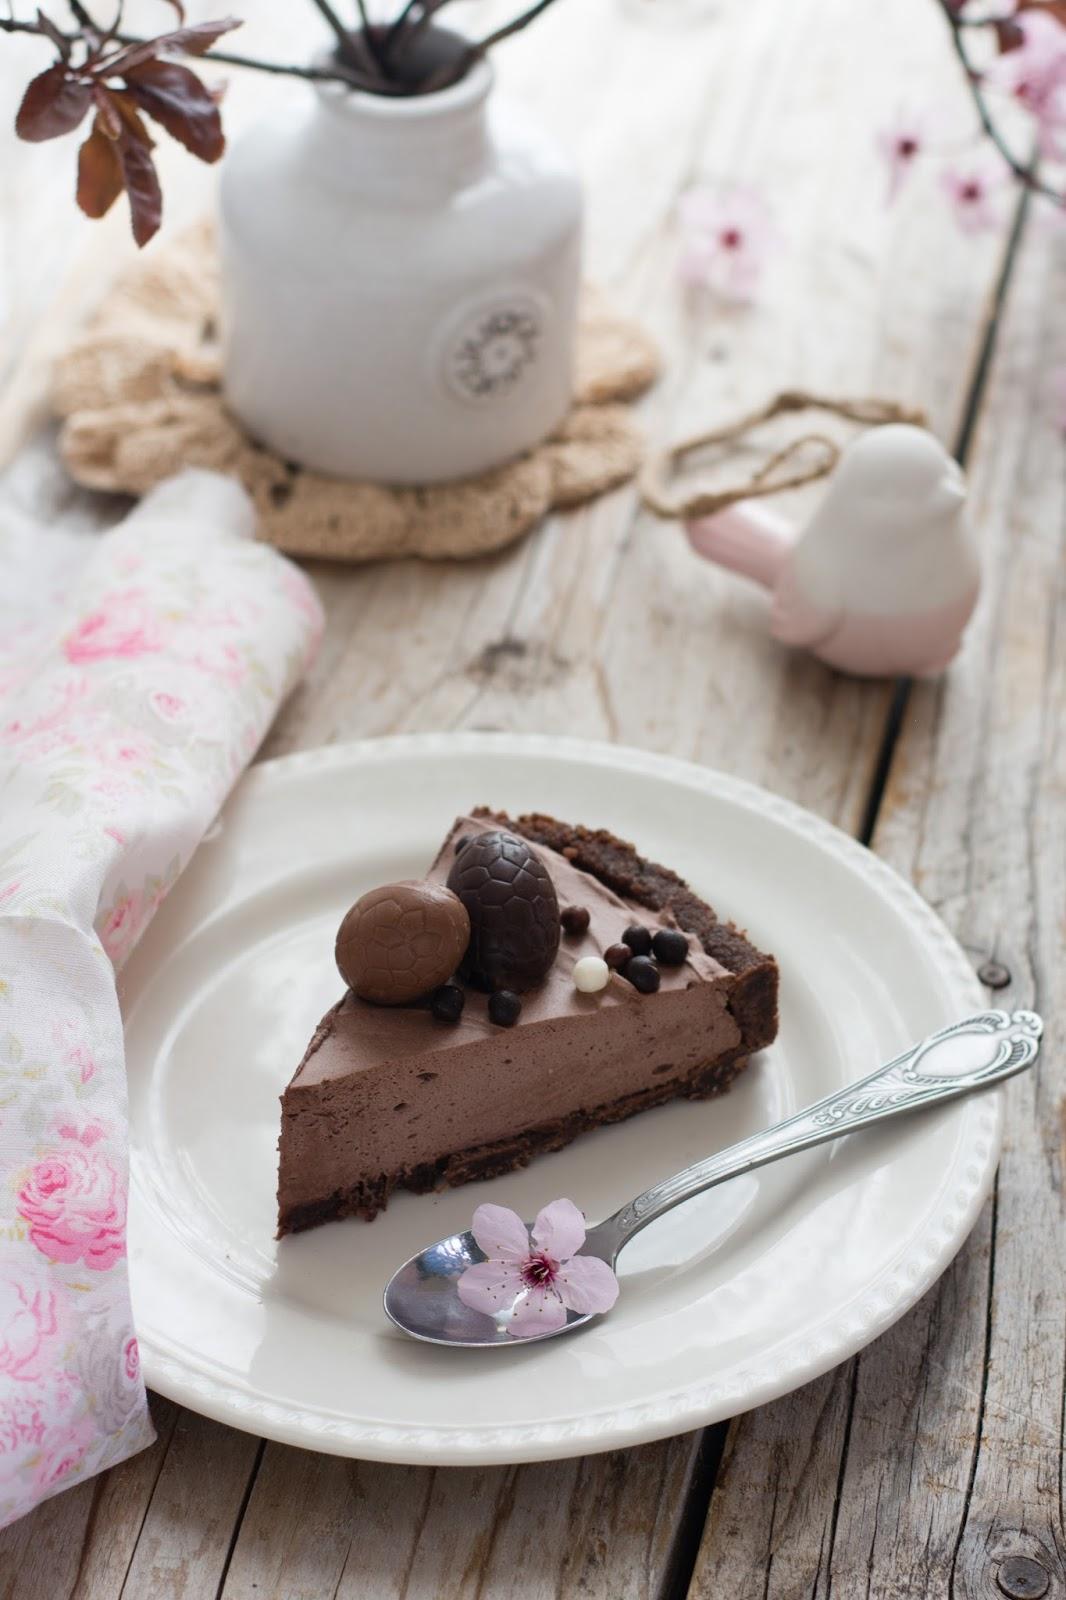 chic chic chocolat tarte au chocolat au baileys. Black Bedroom Furniture Sets. Home Design Ideas